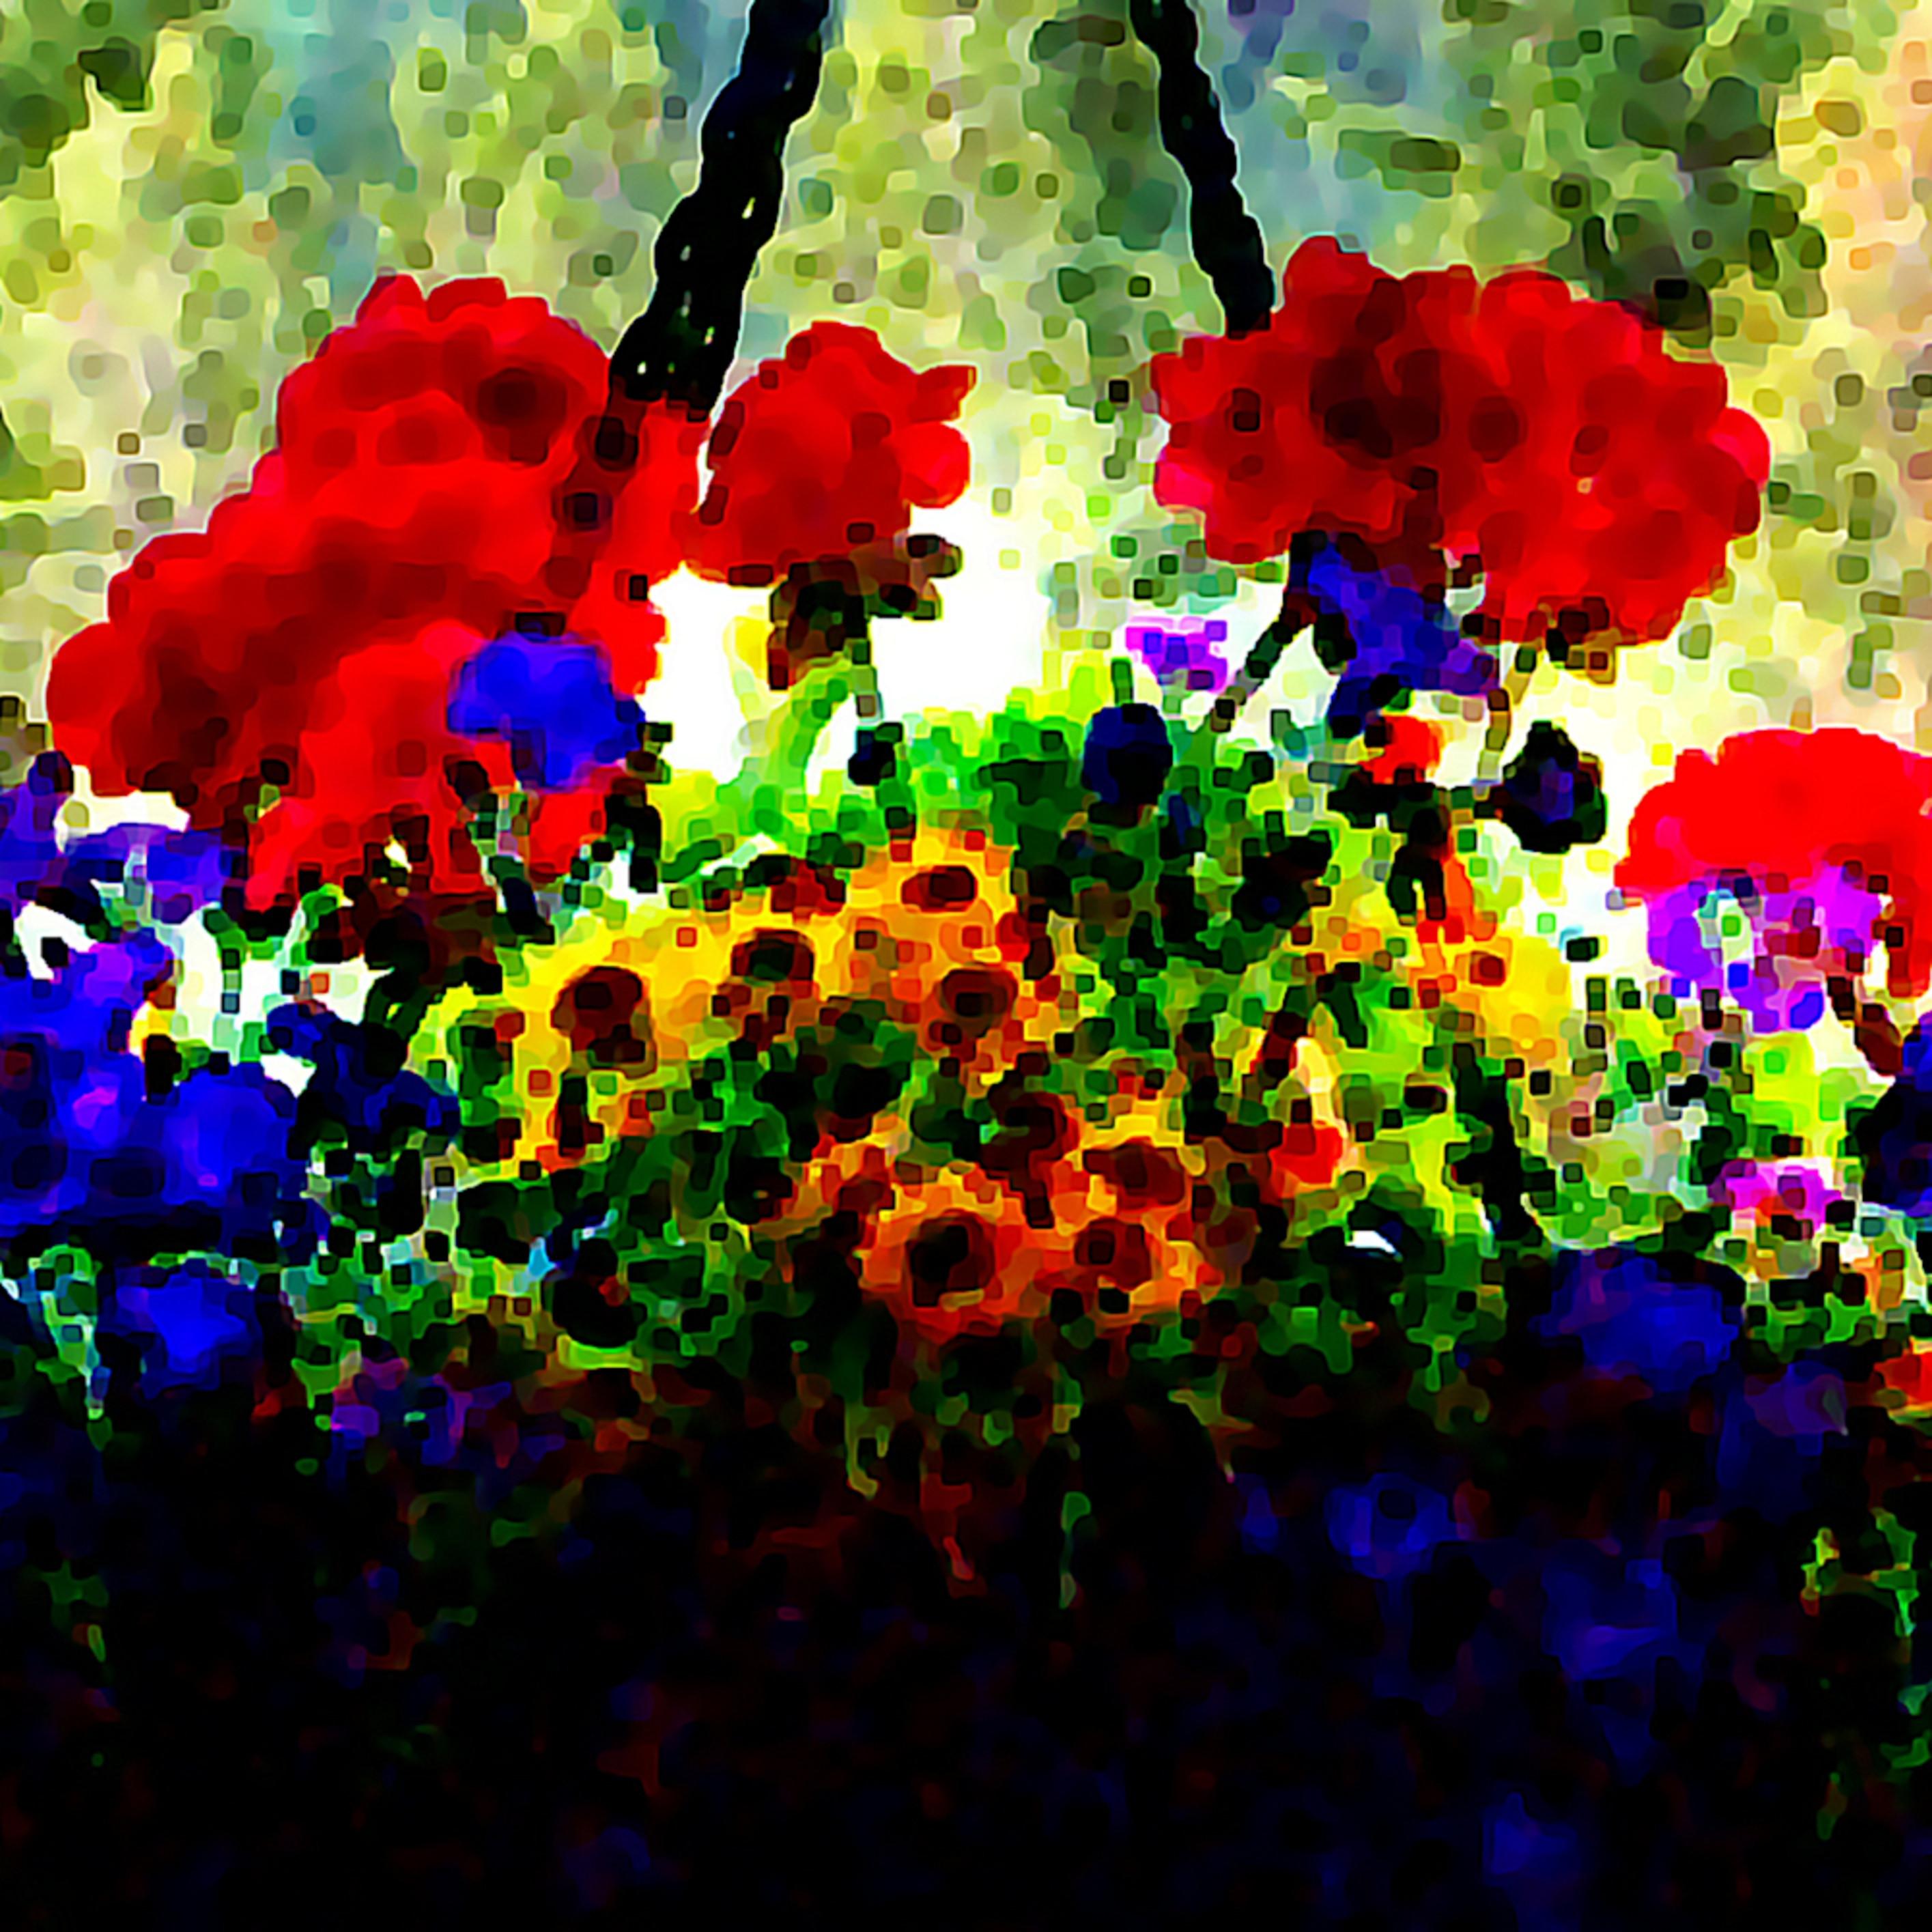 6000 flowers 4 lvrzsb